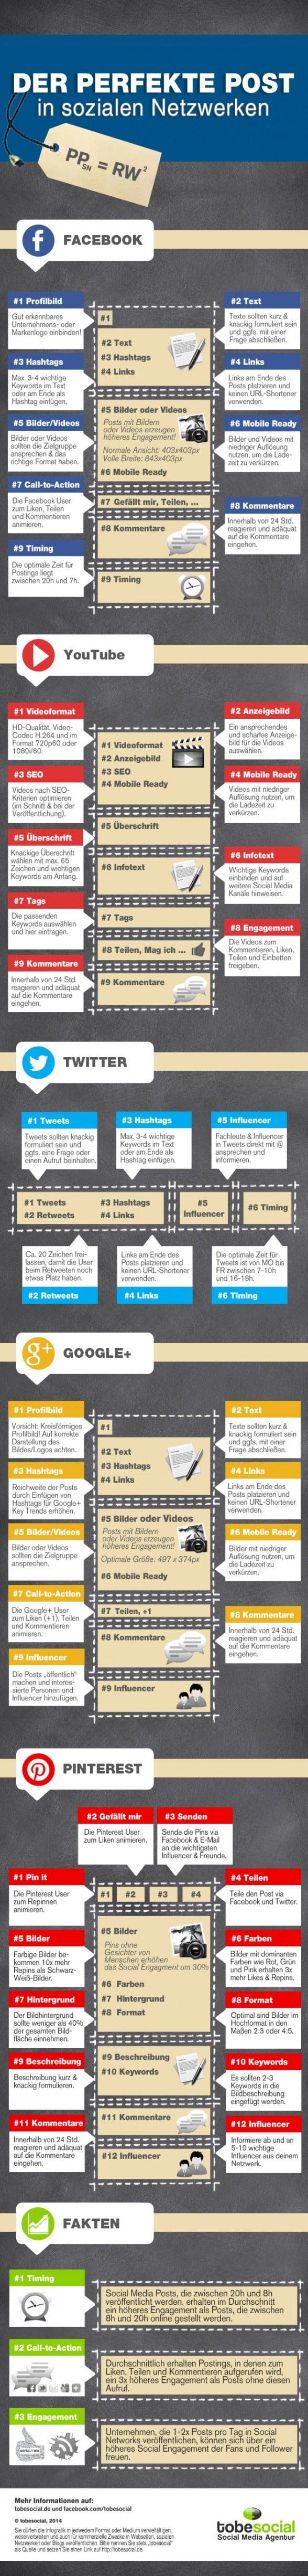 infografik-das-perfekte-posting-für-social-media